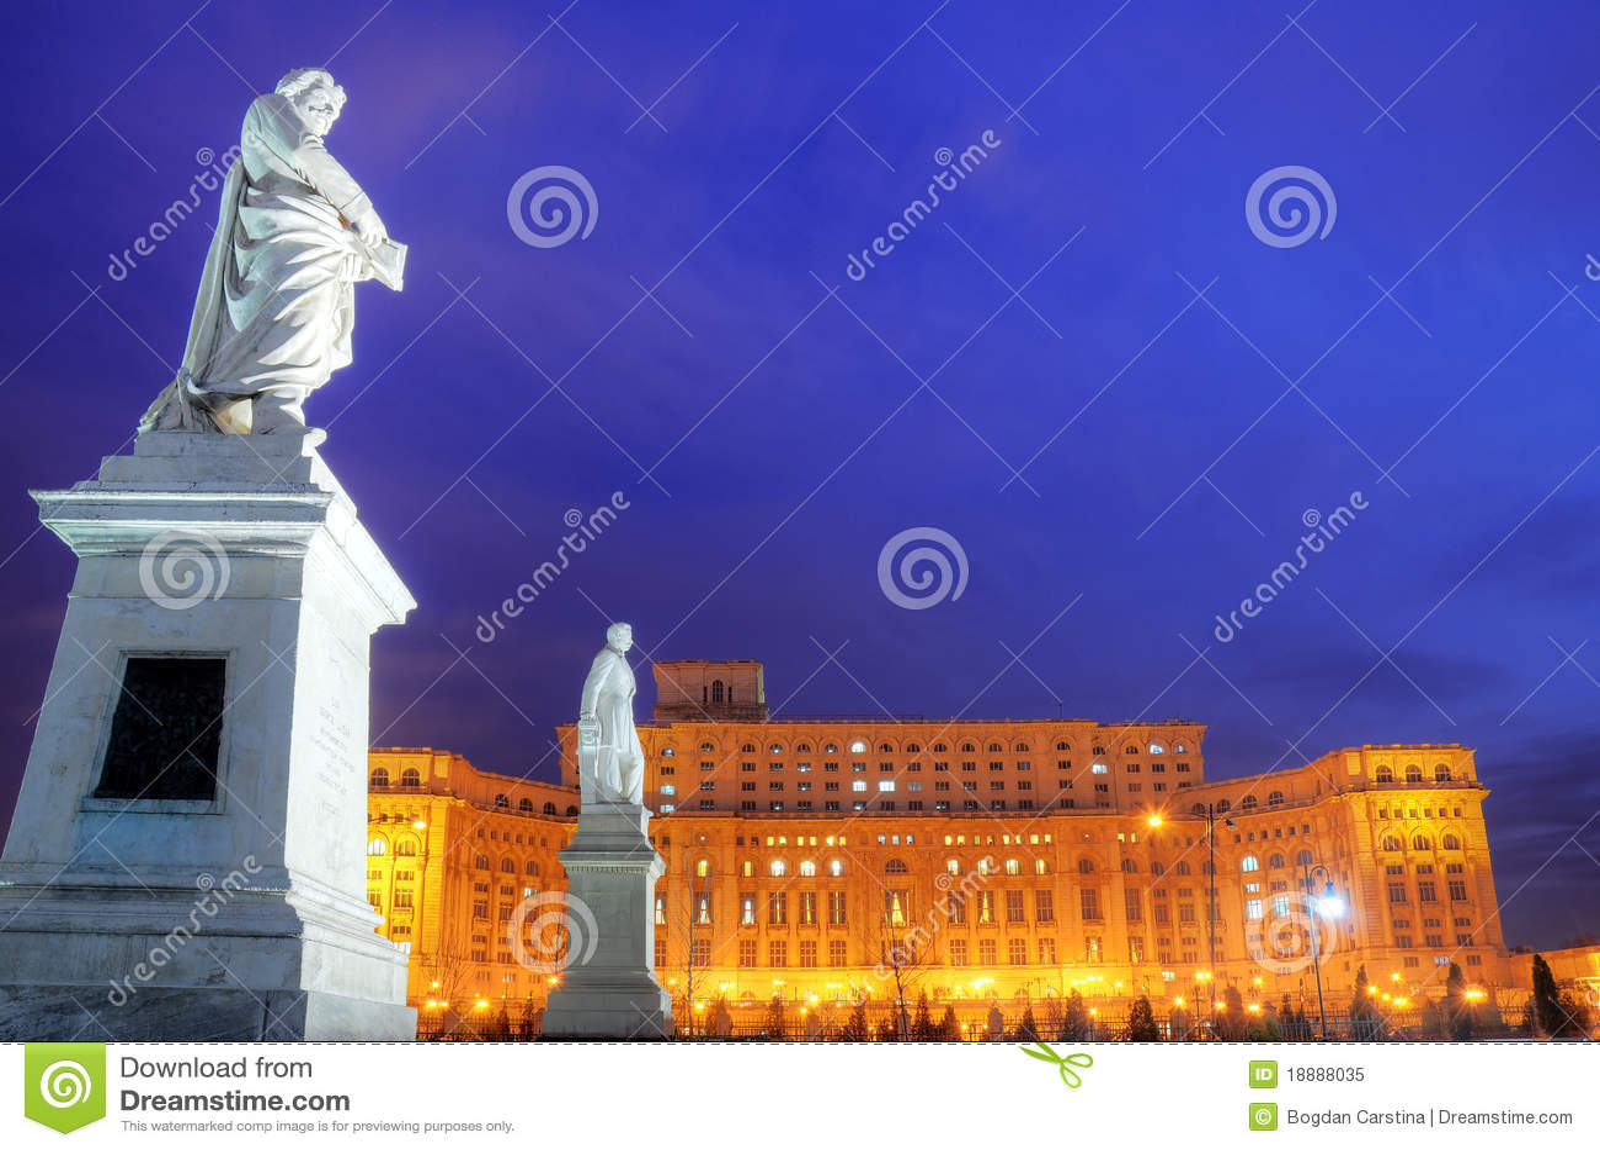 Bucharest - Parliament palace